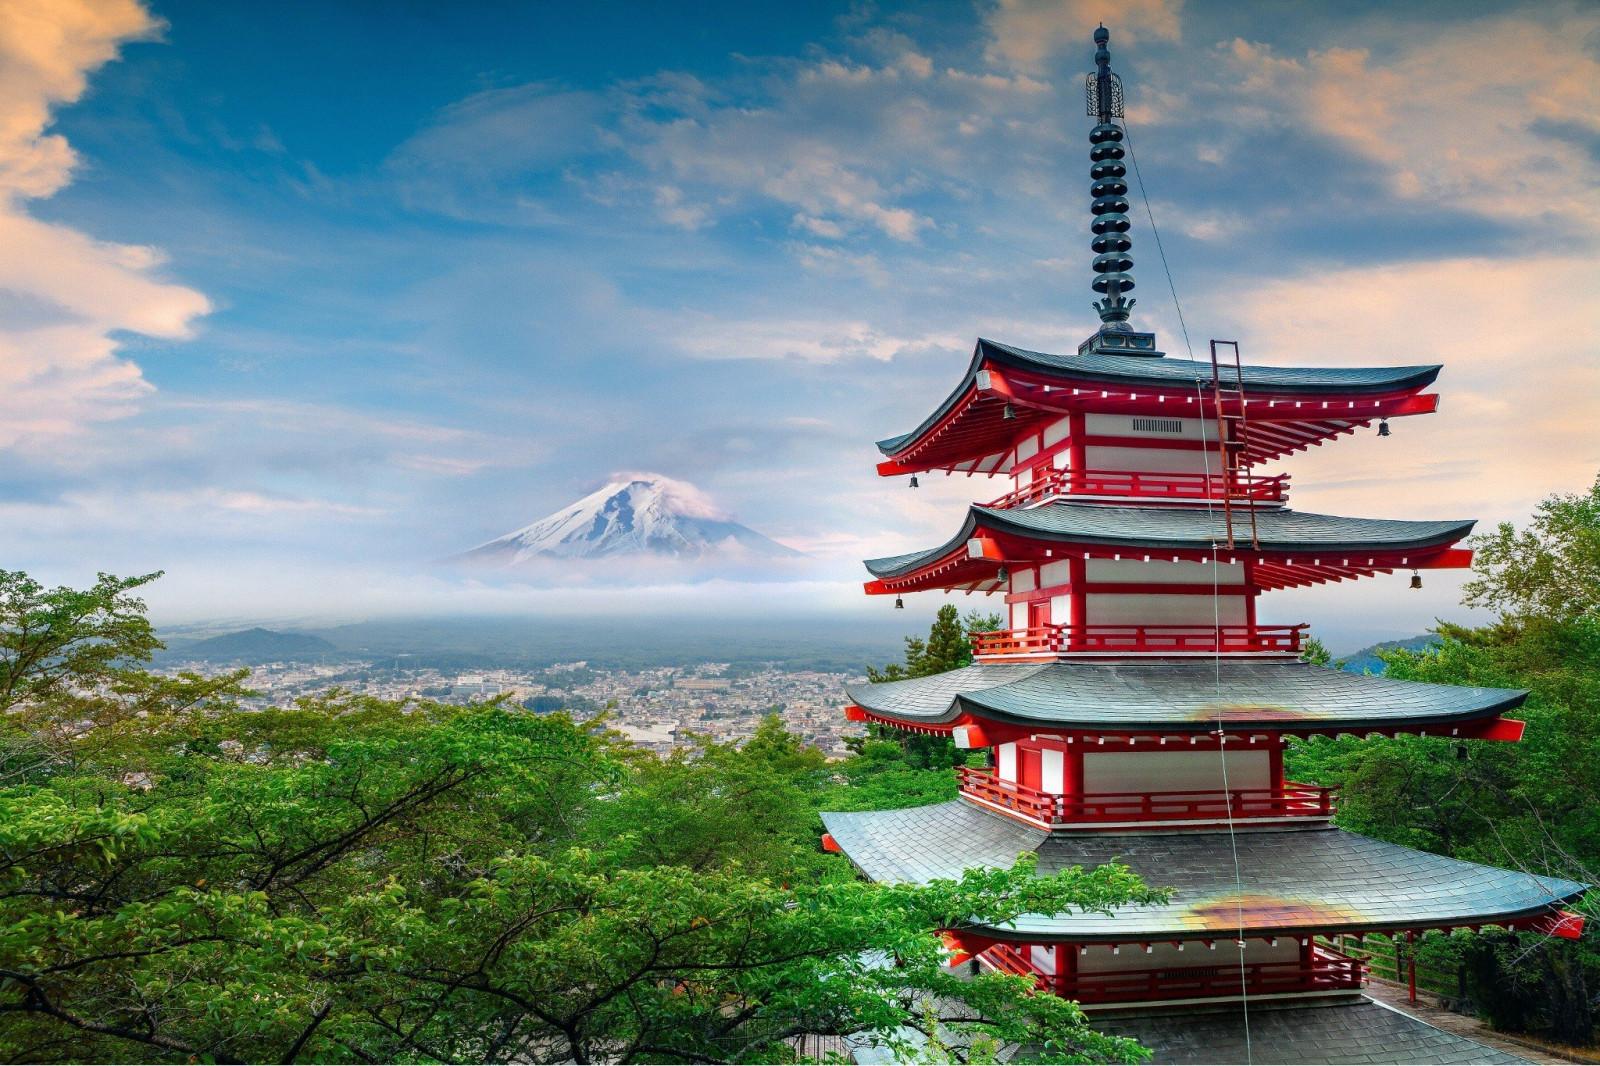 Fond d'écran : 2048x1365 px, bâtiment, Japon 2048x1365 - wallbase - 1215414 - Fond d'écran ...